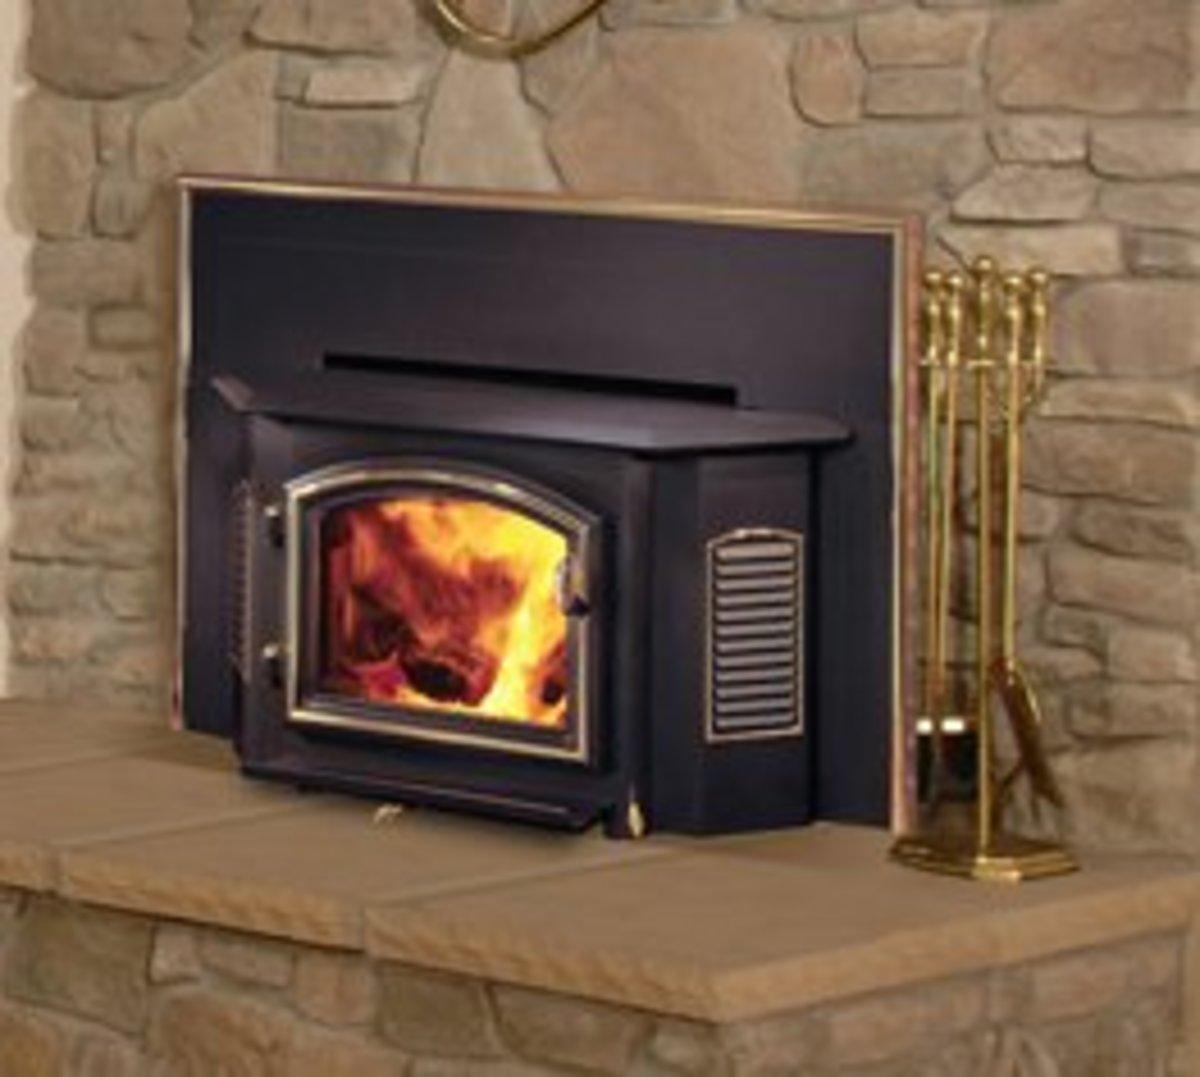 A Regency Wood Burning Fireplace Insert